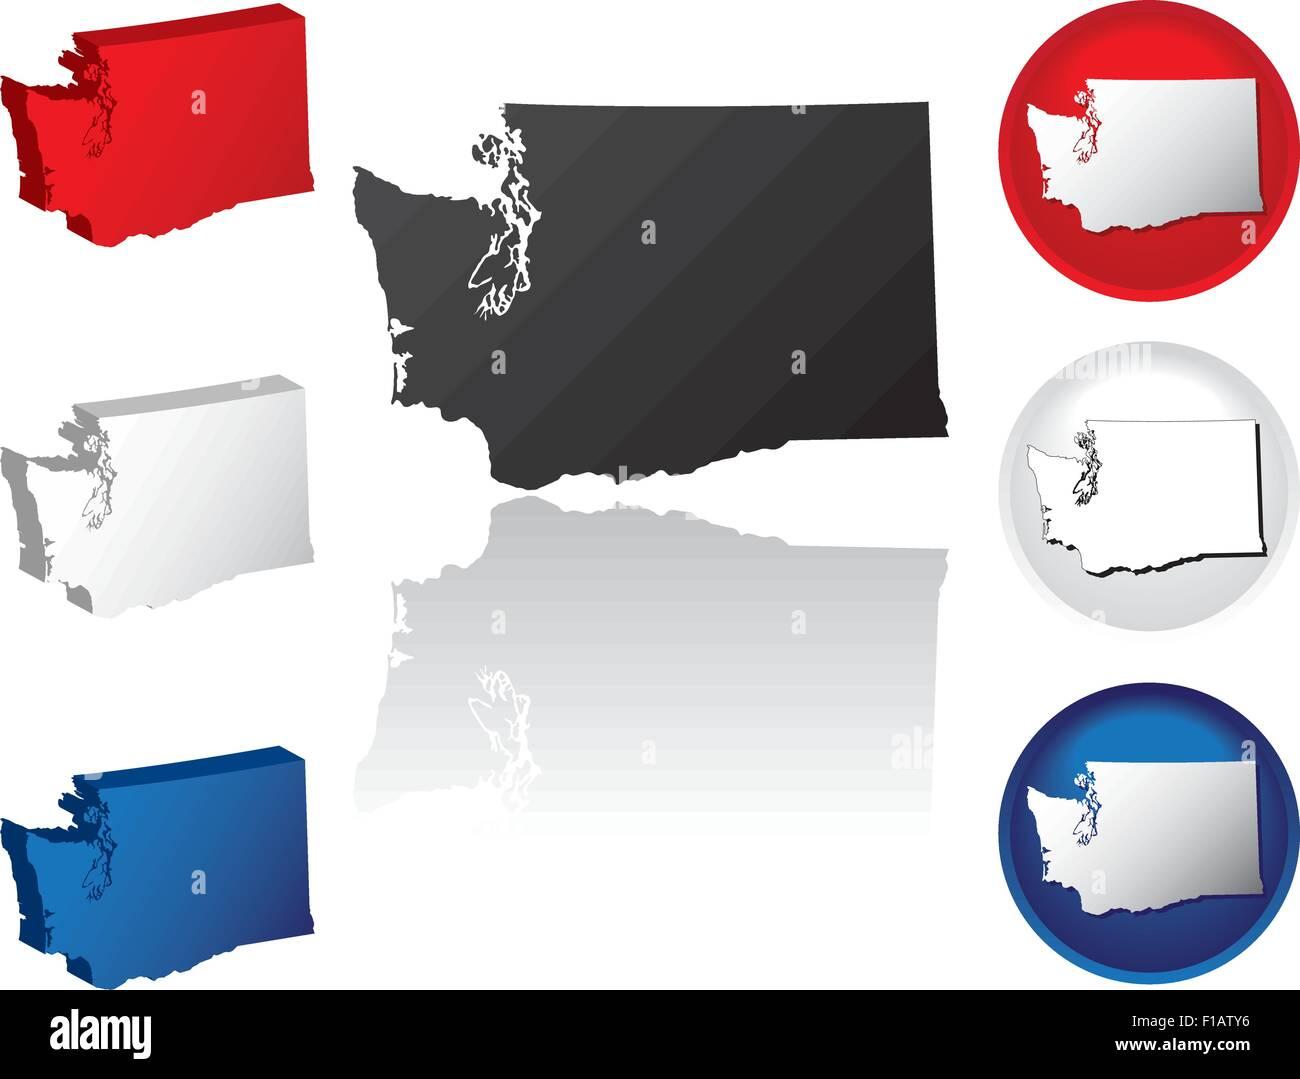 Washington Icons - Stock Vector